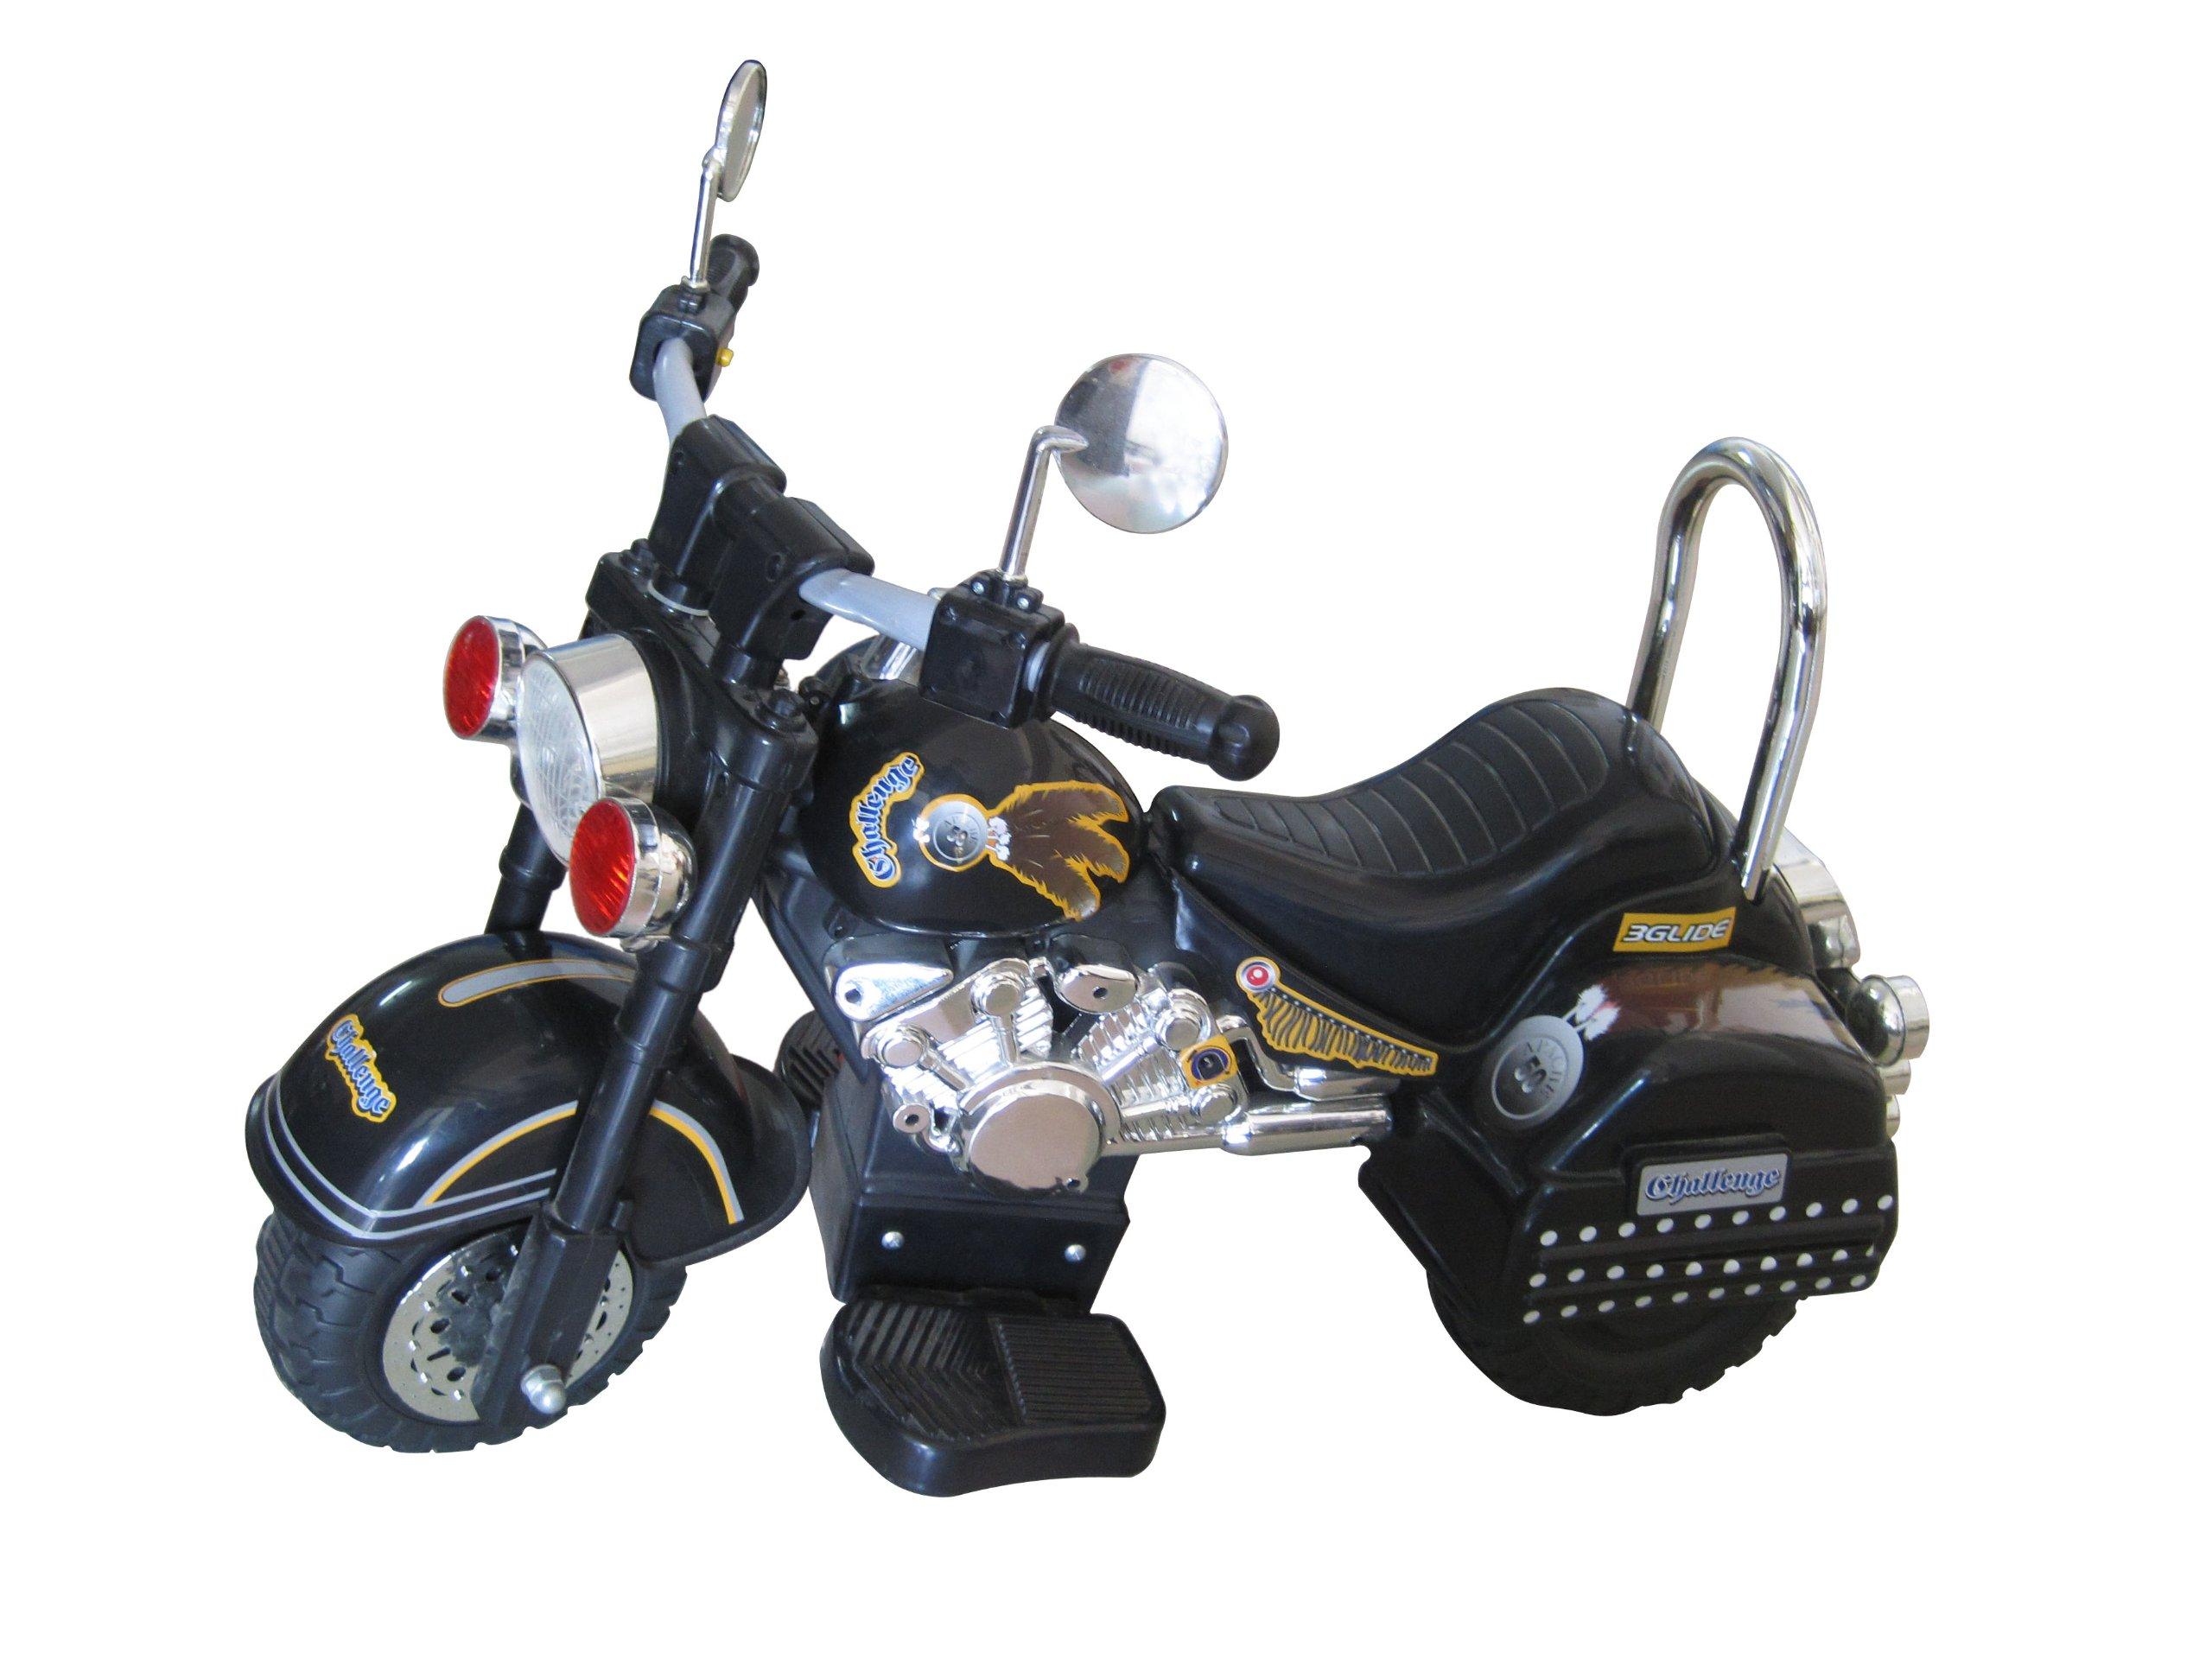 Merske Harley Style 6V Battery Operated Kids Motorcycle, Black